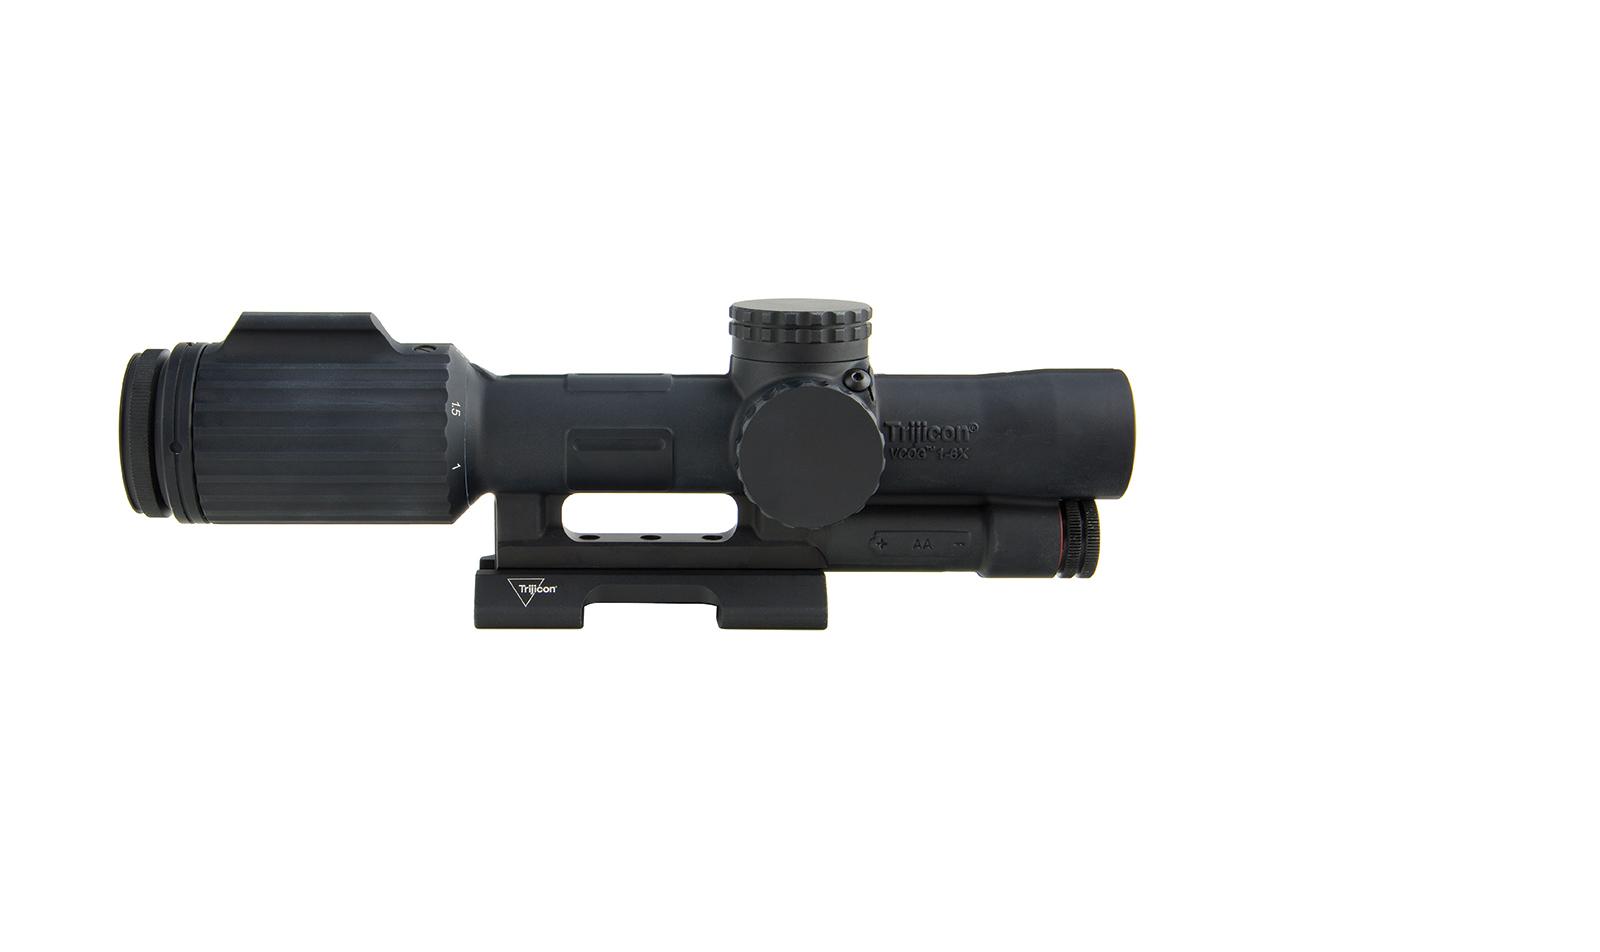 VC16-C-1600050 angle 6